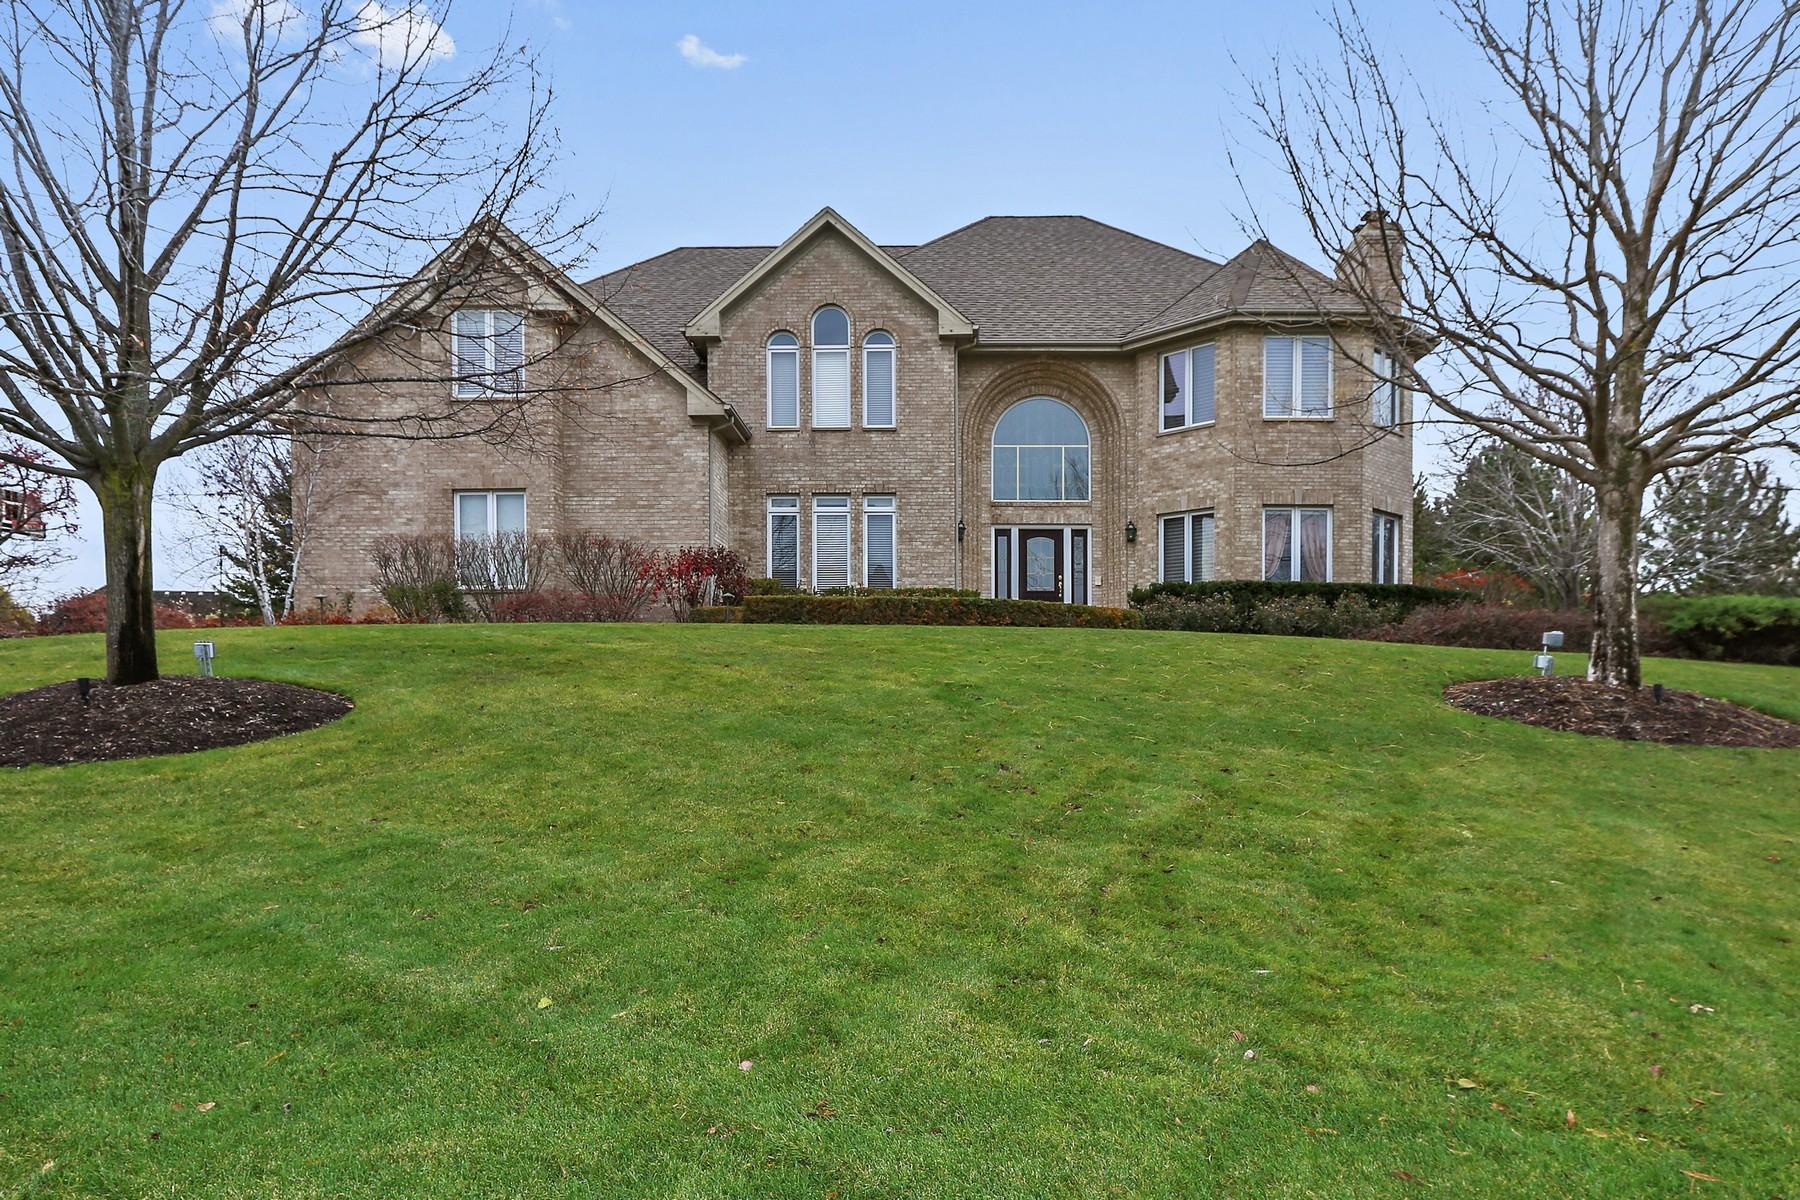 Casa para uma família para Venda às Fabulous Location Sited High Looking Down The Waterway 21556 W Swan Court Kildeer, Illinois, 60047 Estados Unidos